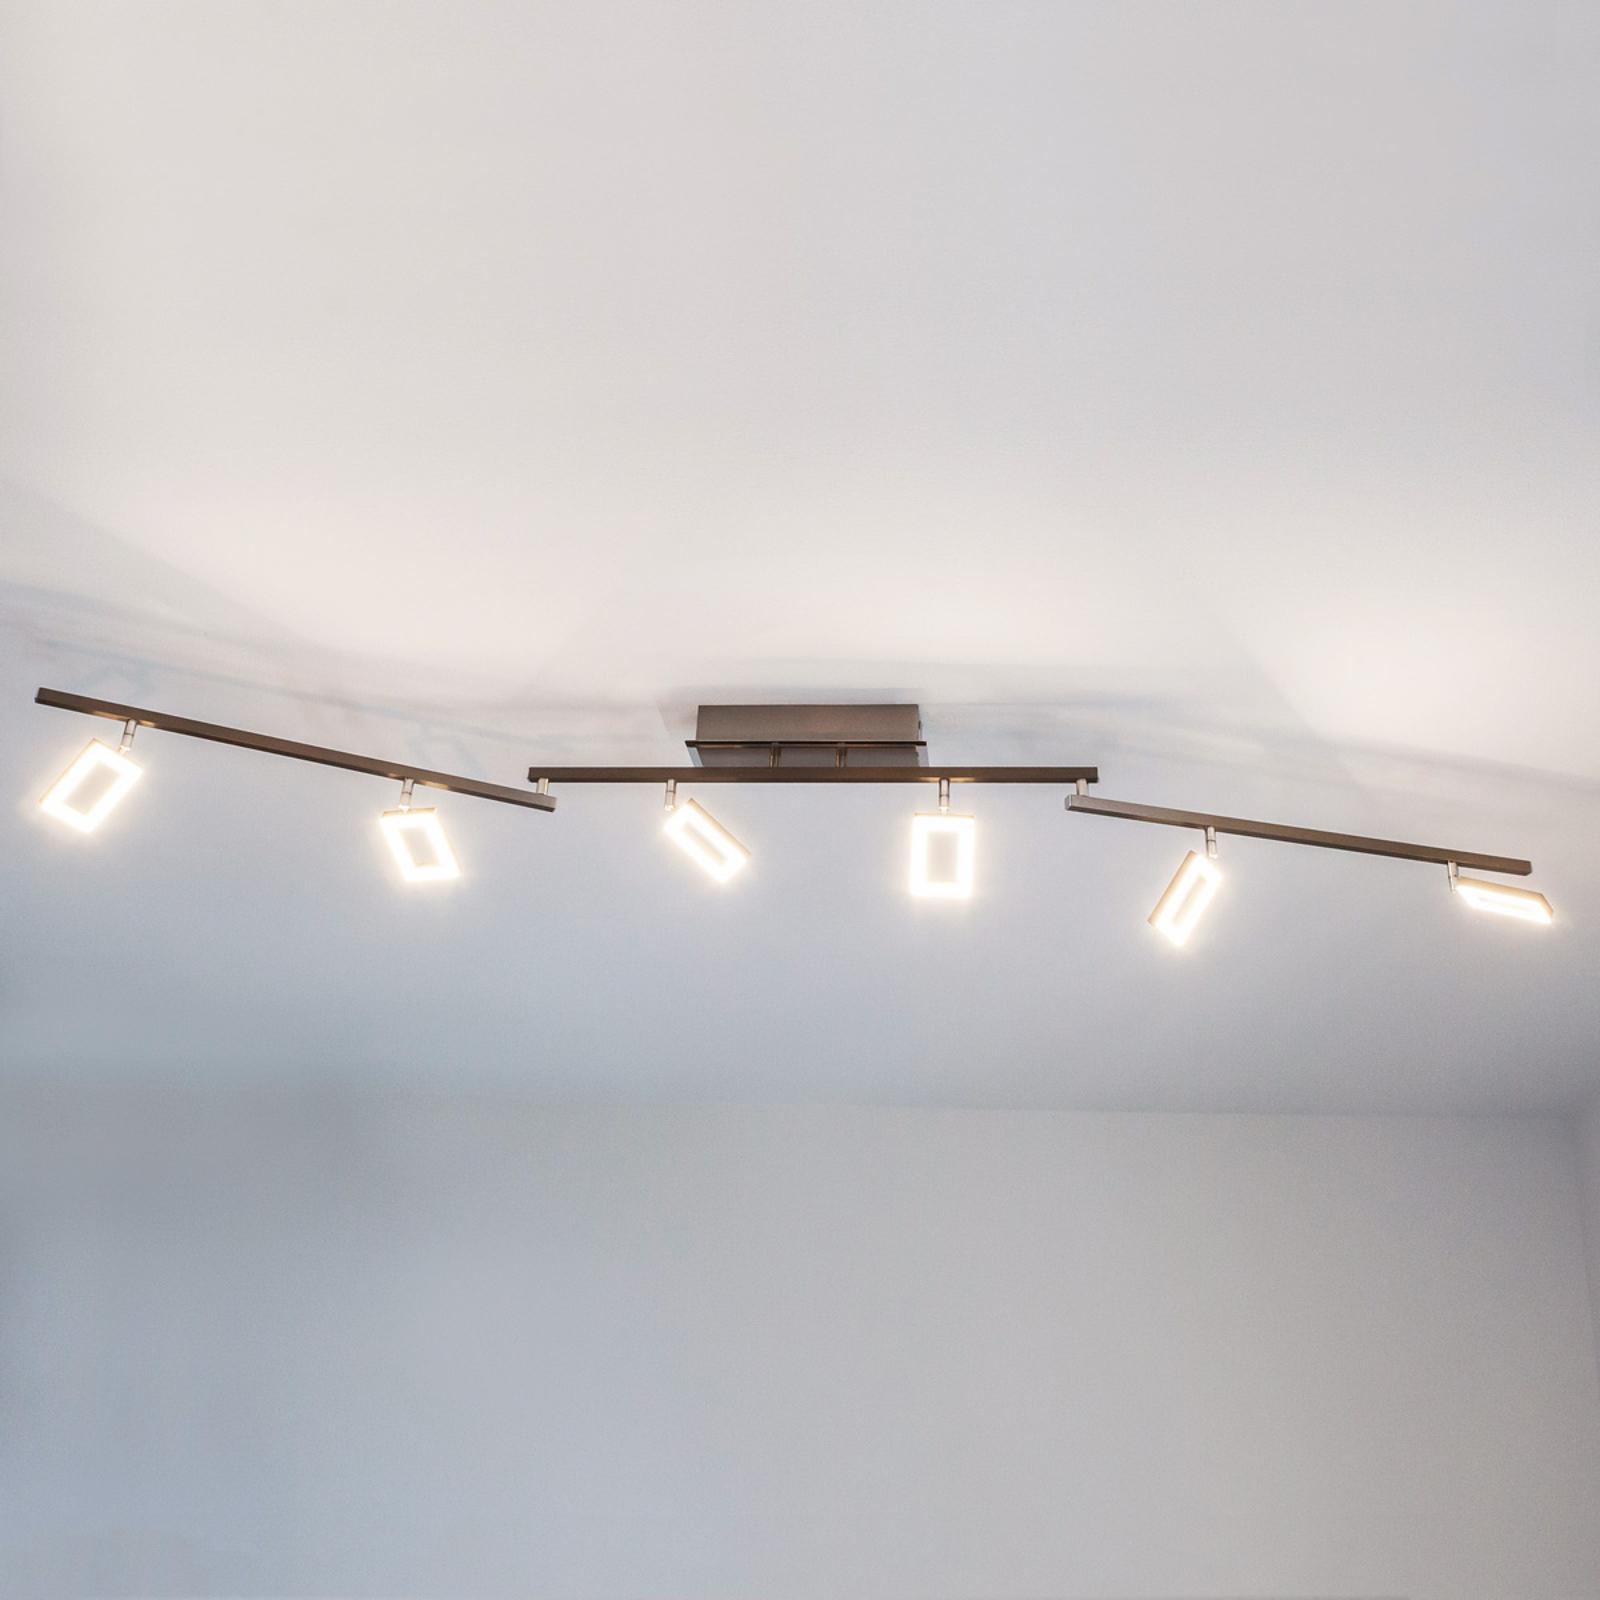 6-punktowa lampa sufitowa LED Inigo